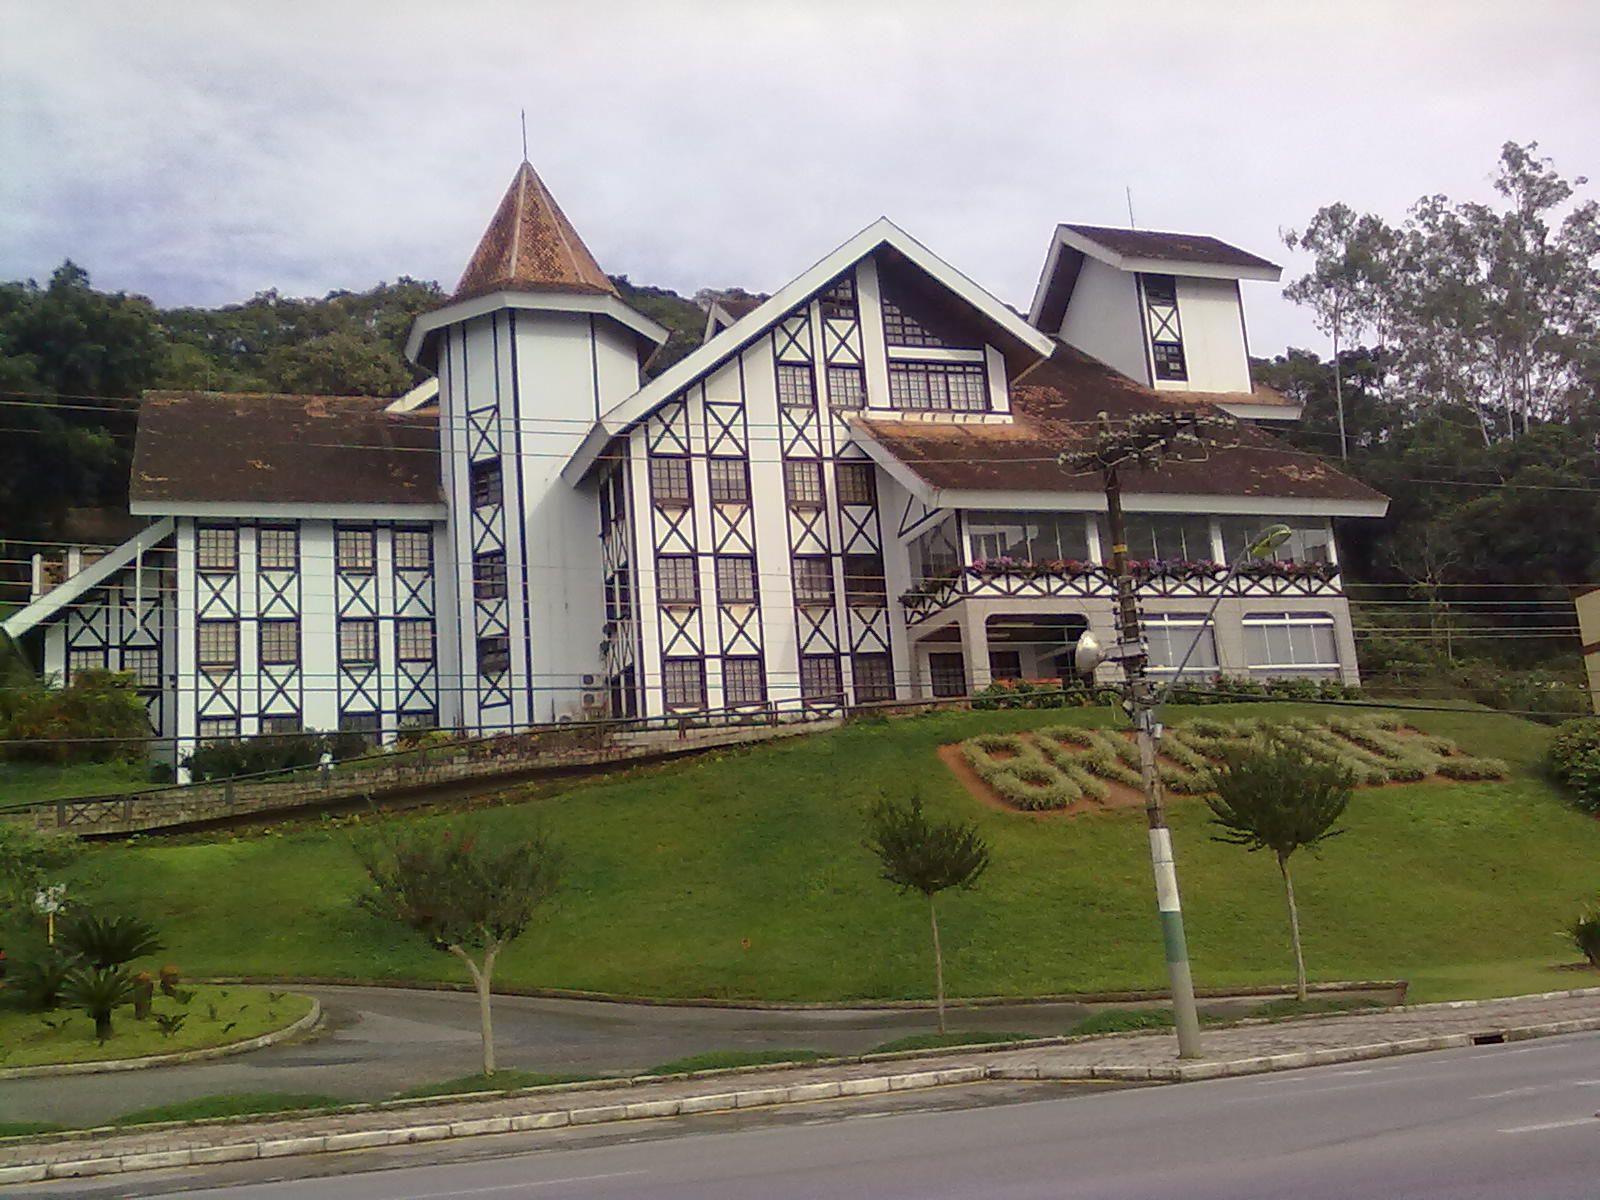 Brusque - Santa Catarina - Brasil